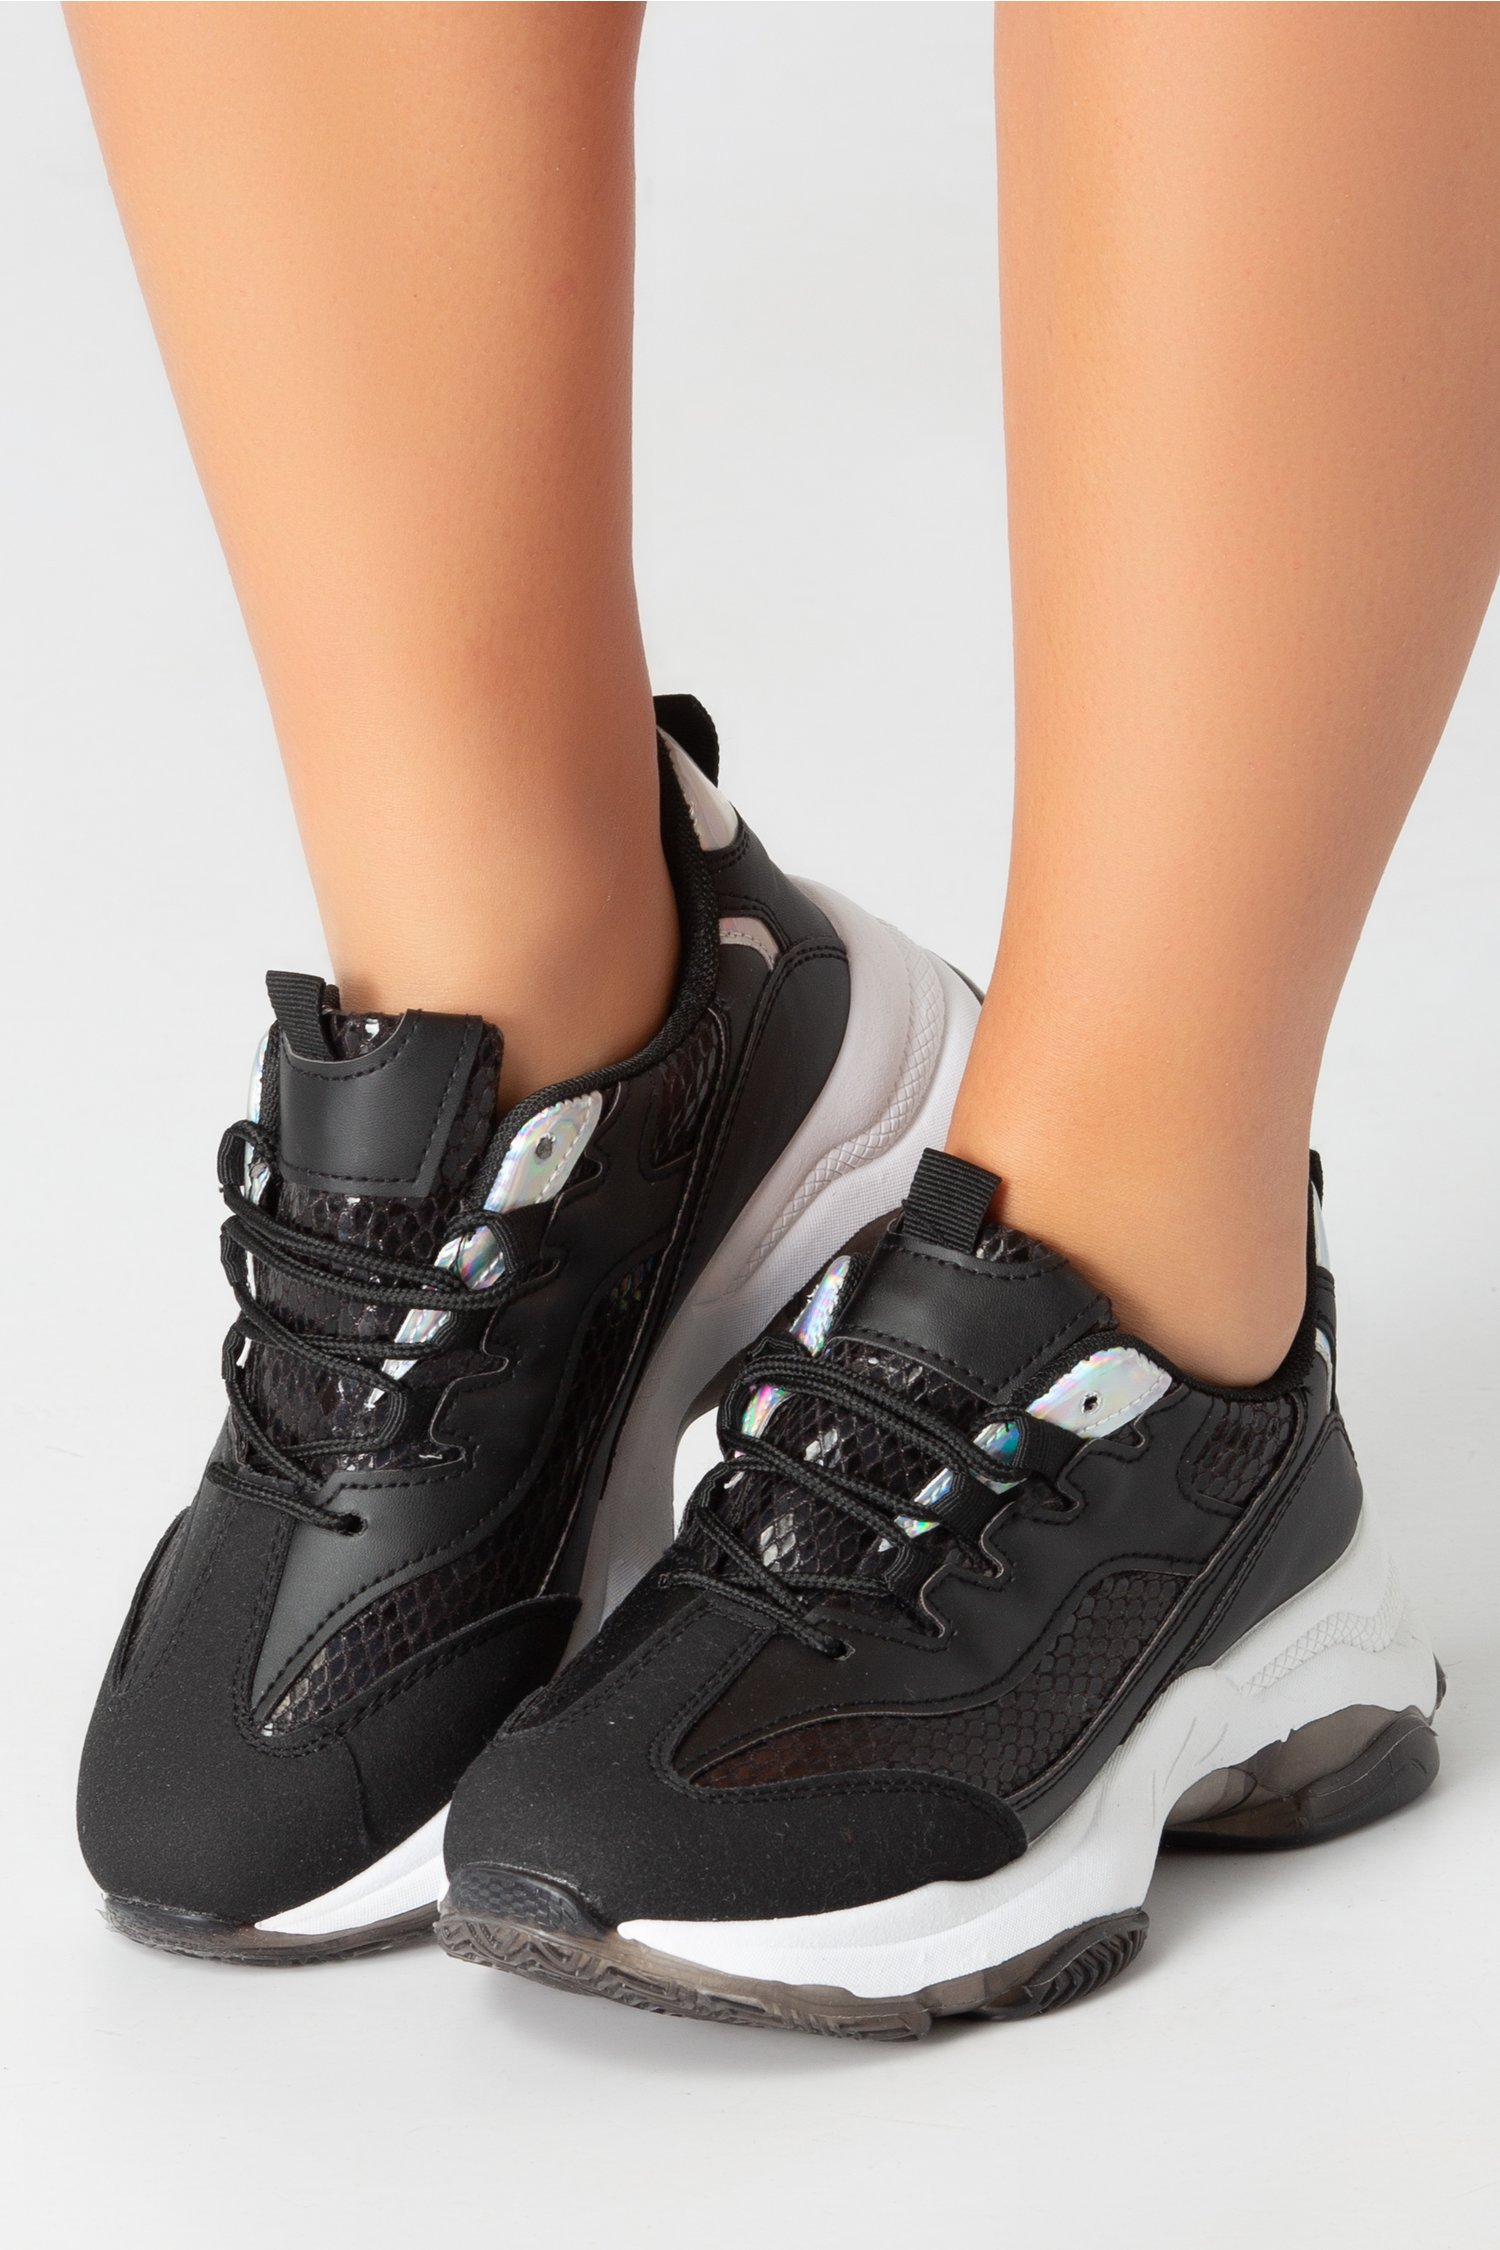 Pantofi sport negri cu detalii reflctorizante